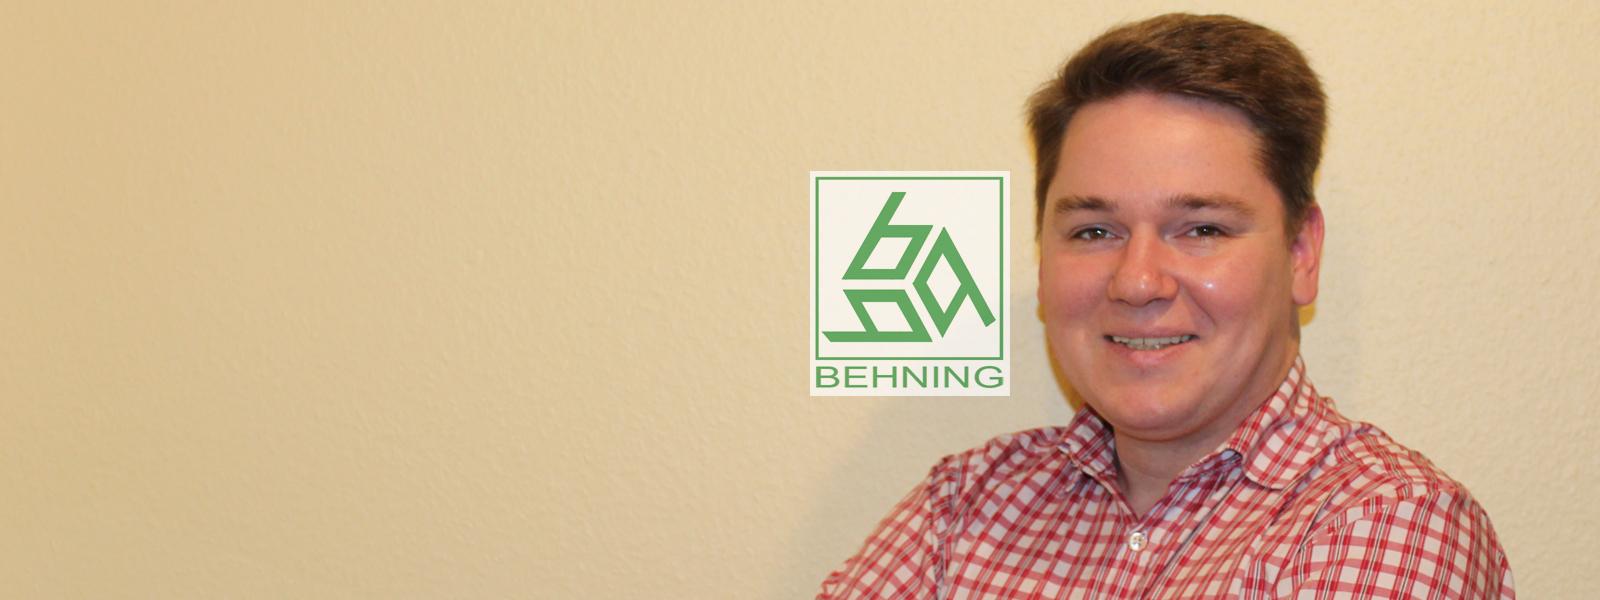 Behning-Pharma